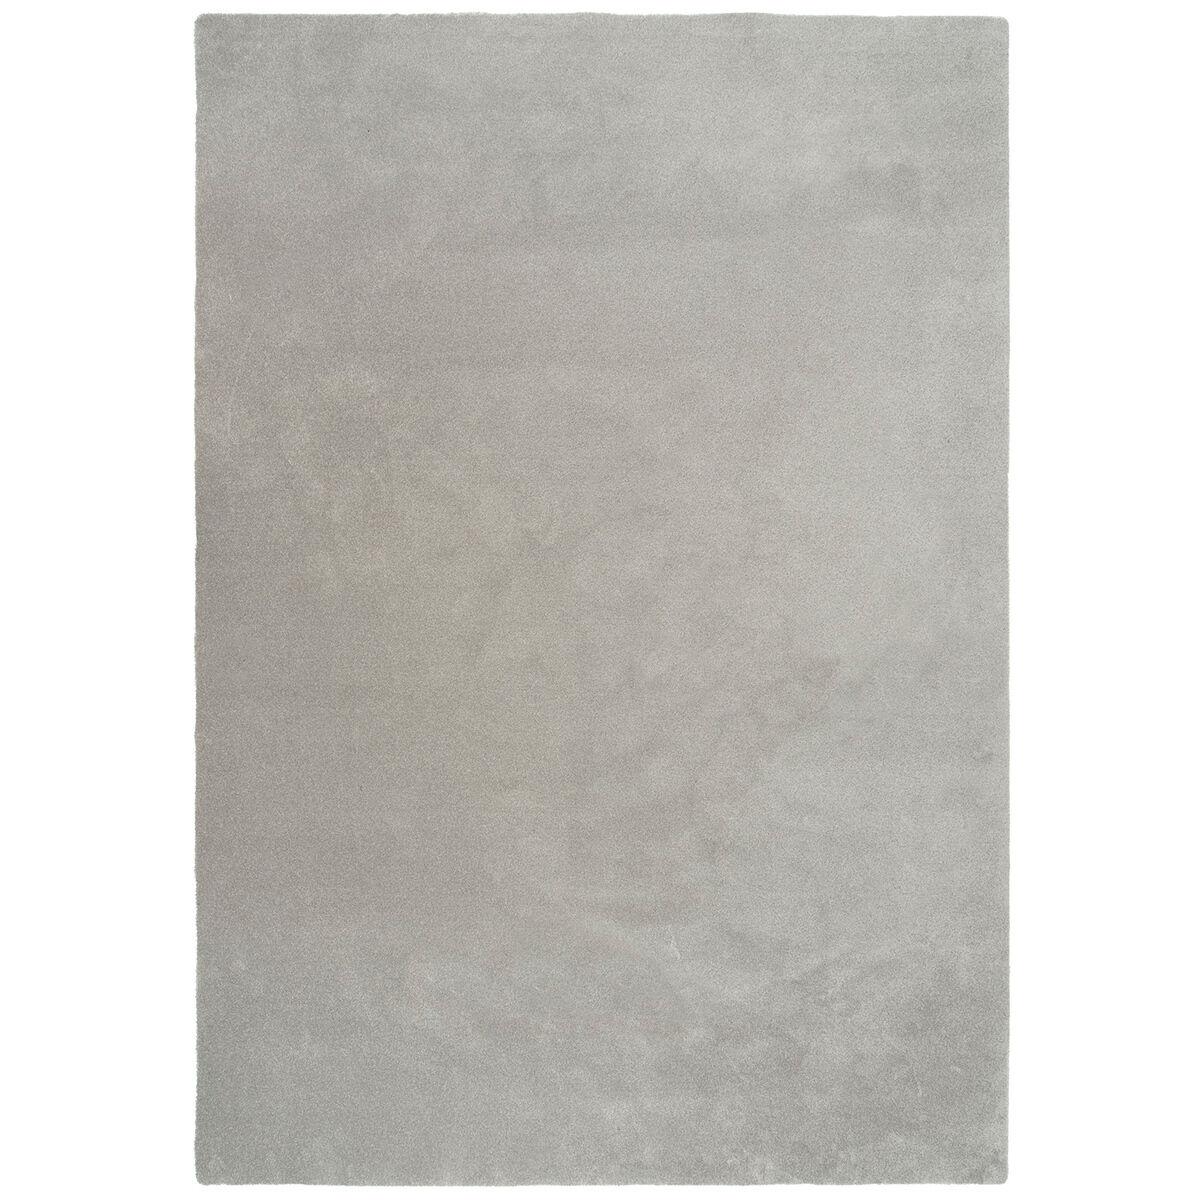 VM Carpet Hattara matto, harmaa